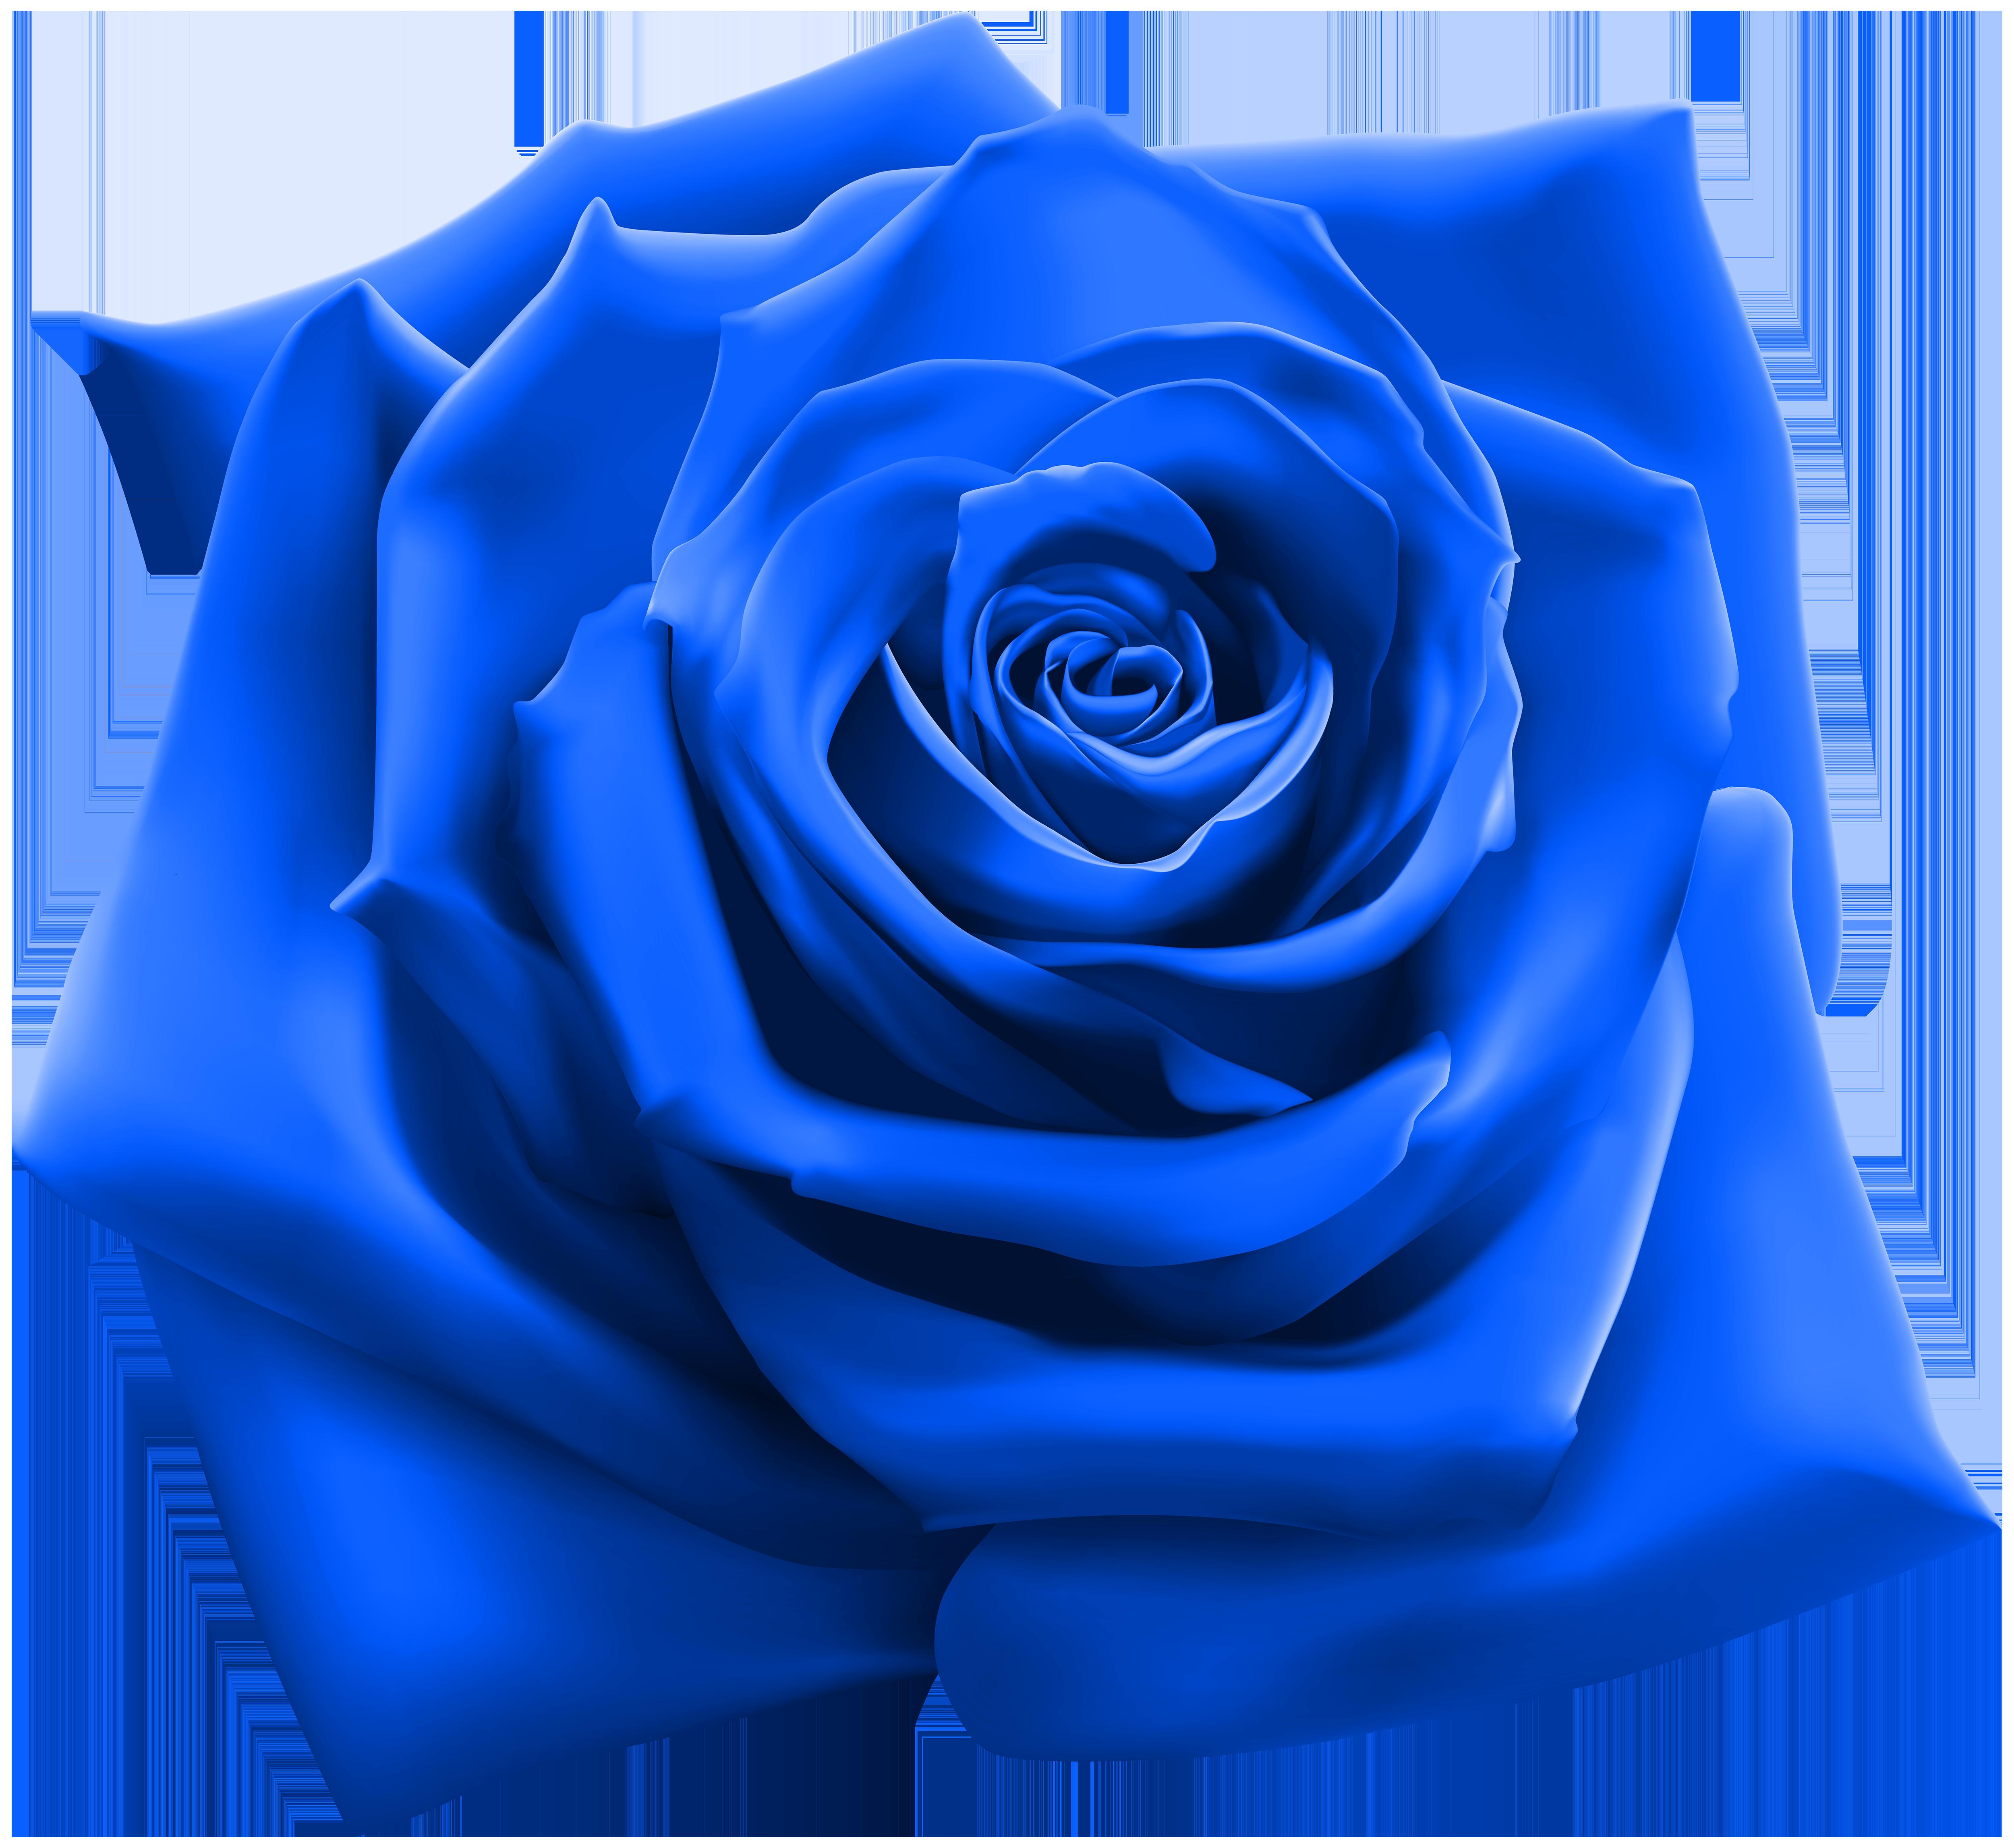 Https www google com images hpp blue internaut 96x96 png.